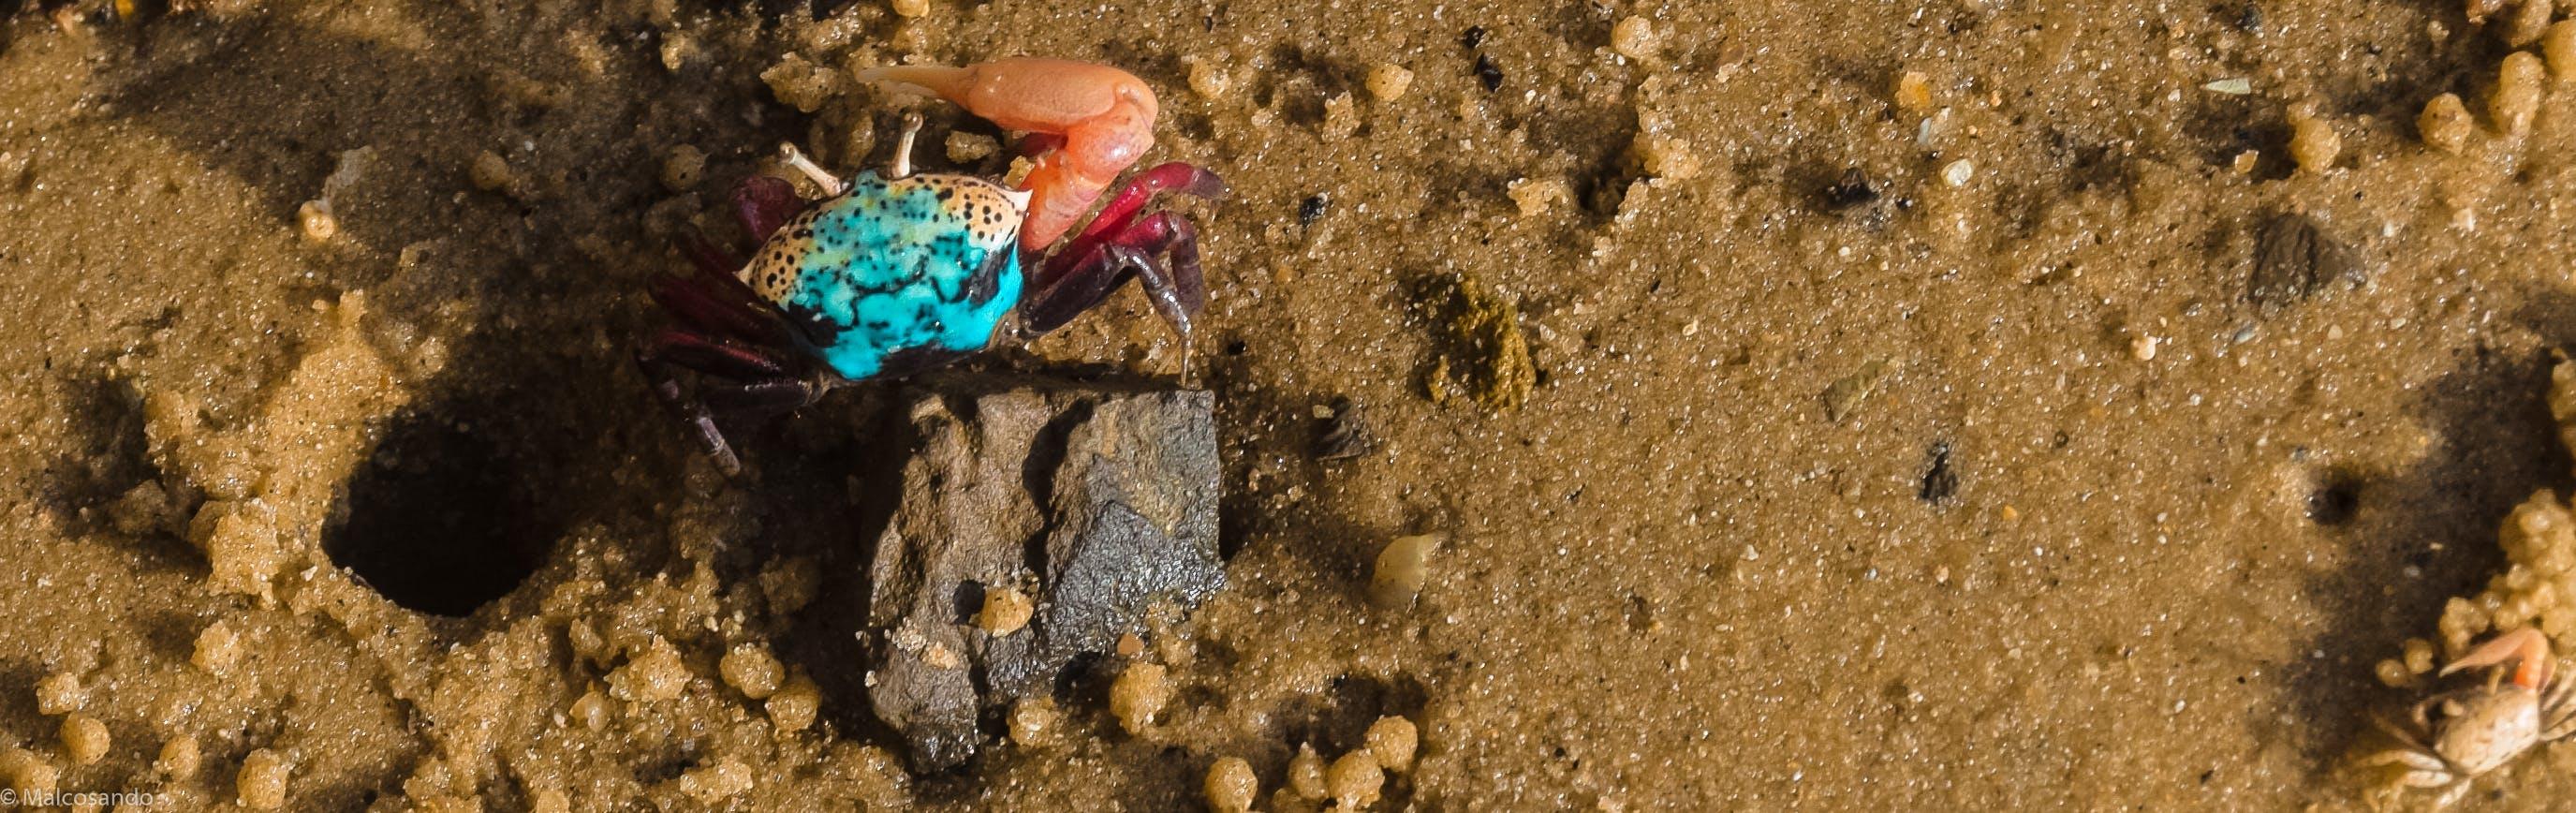 Free stock photo of beach, crab, Kenya, macro photography